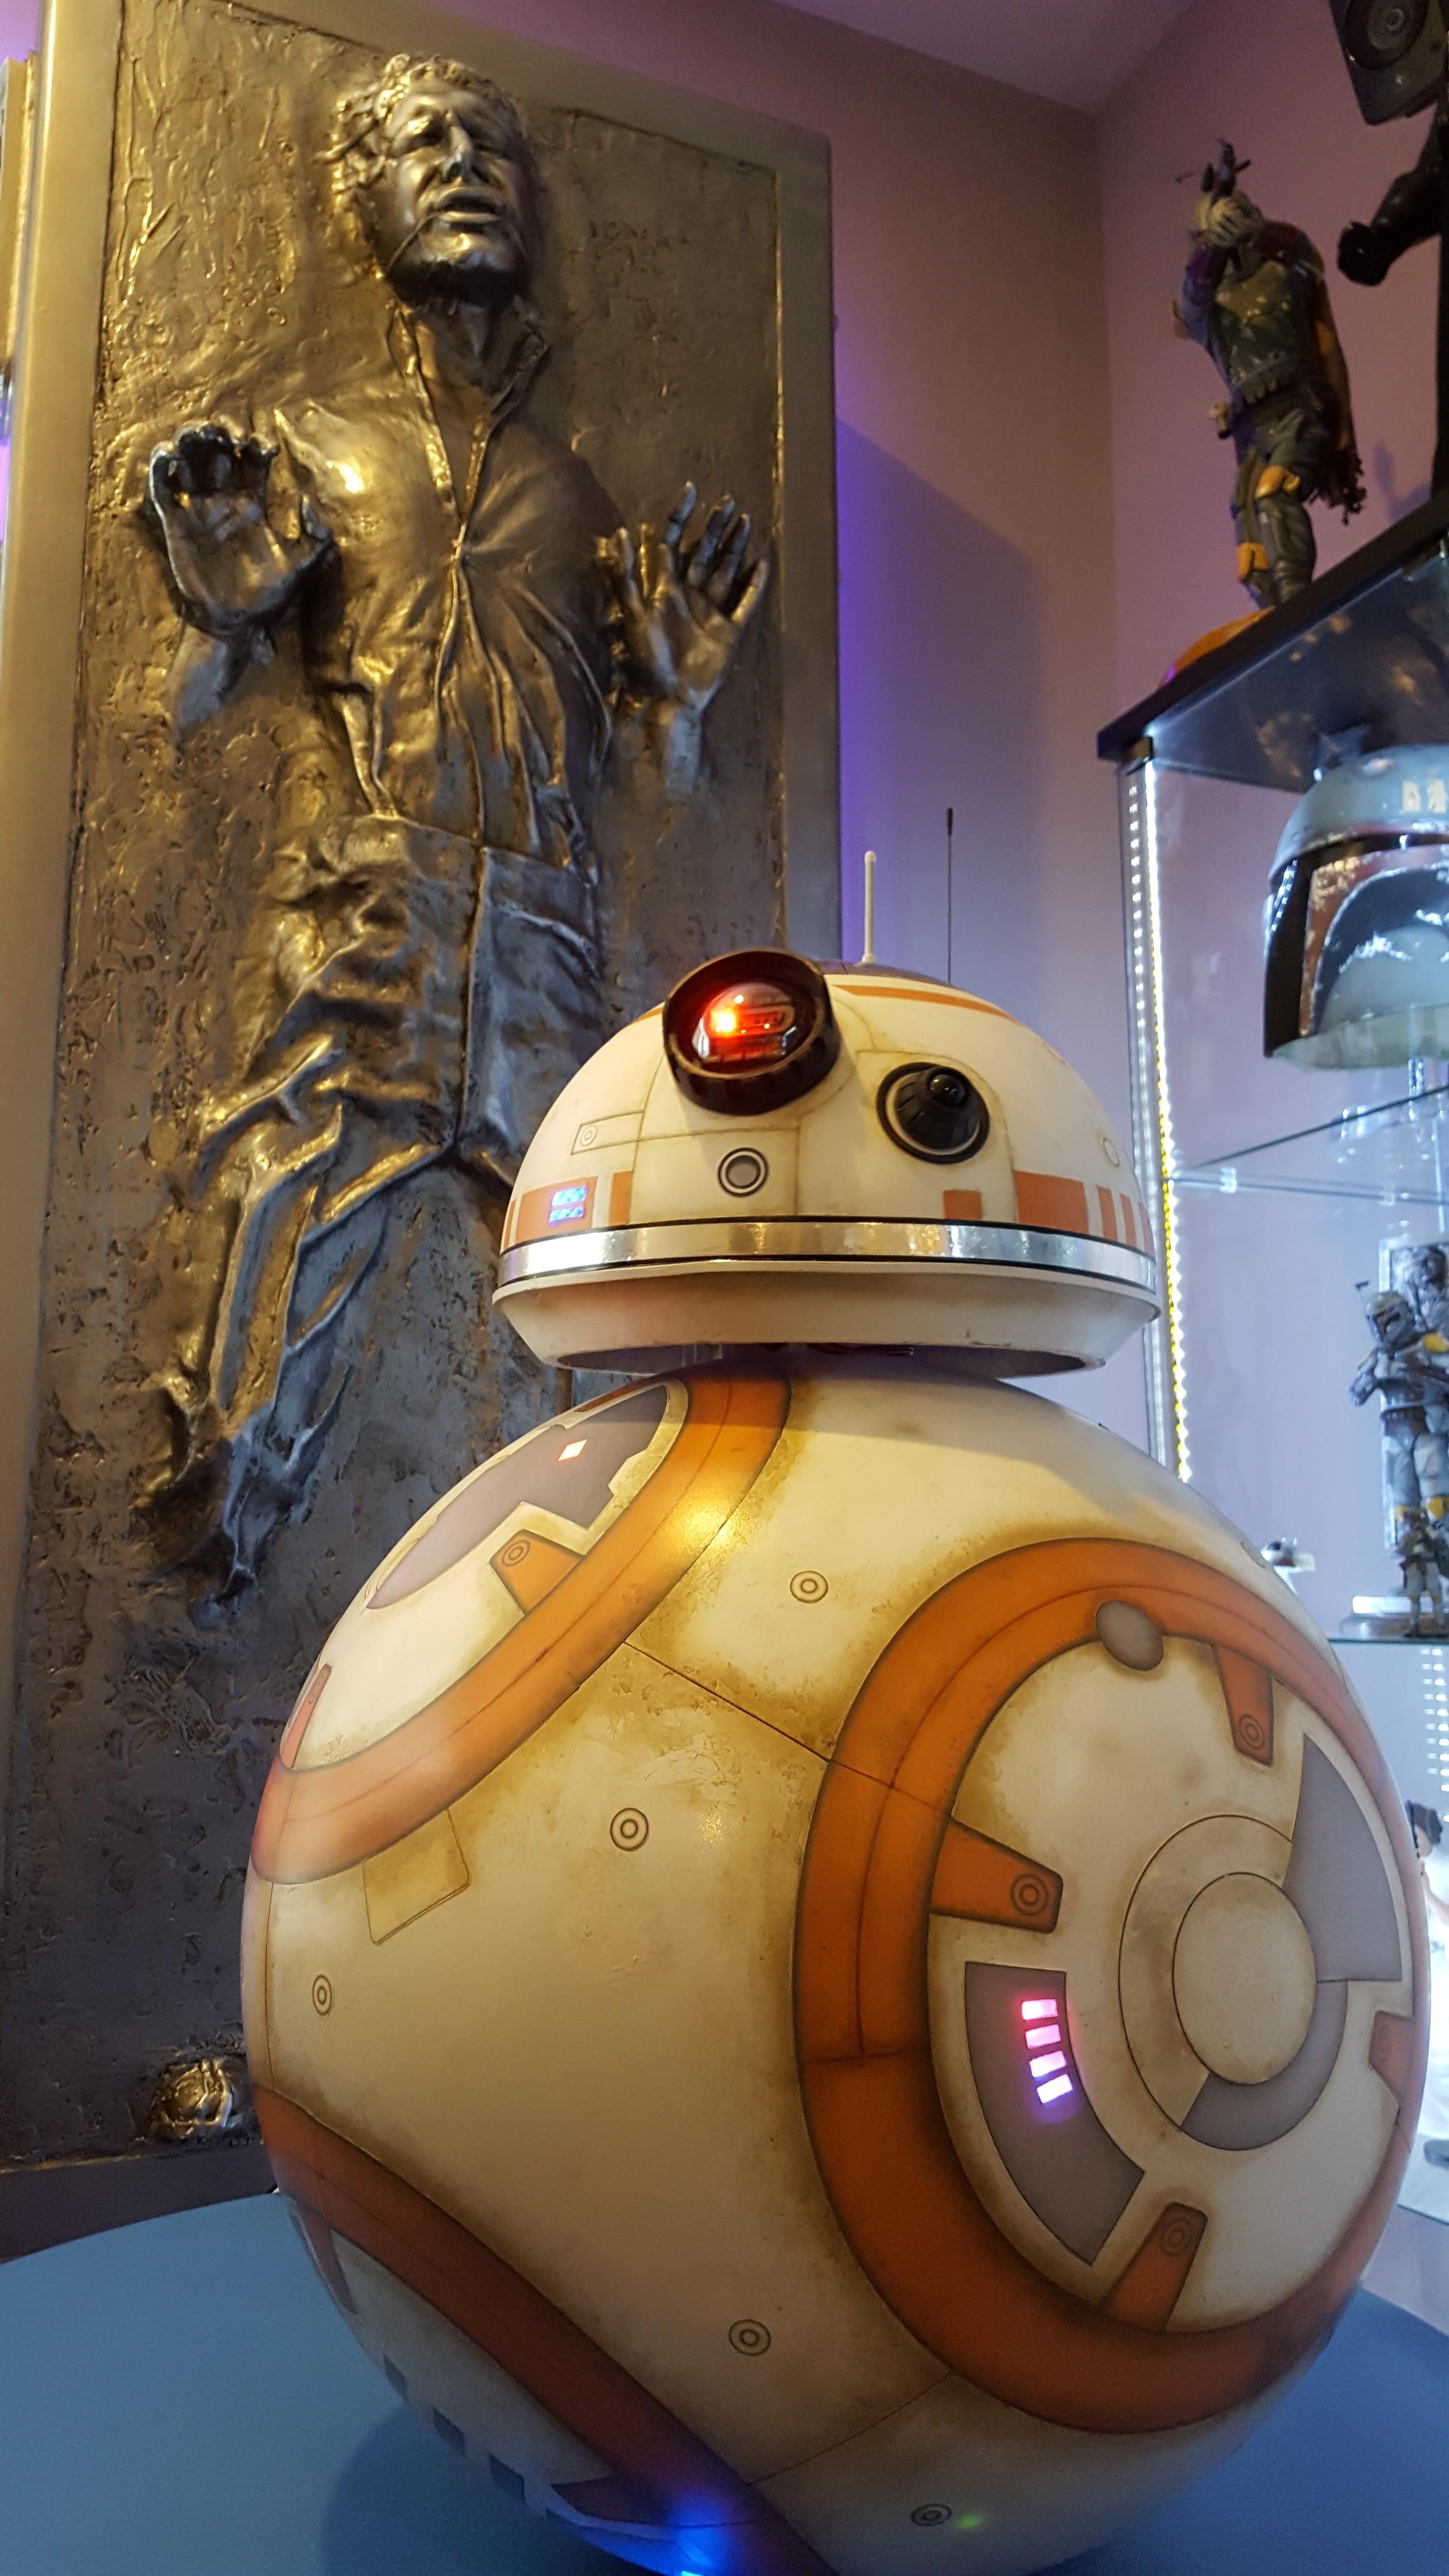 Star Wars Han Solo Carbonite BB-8